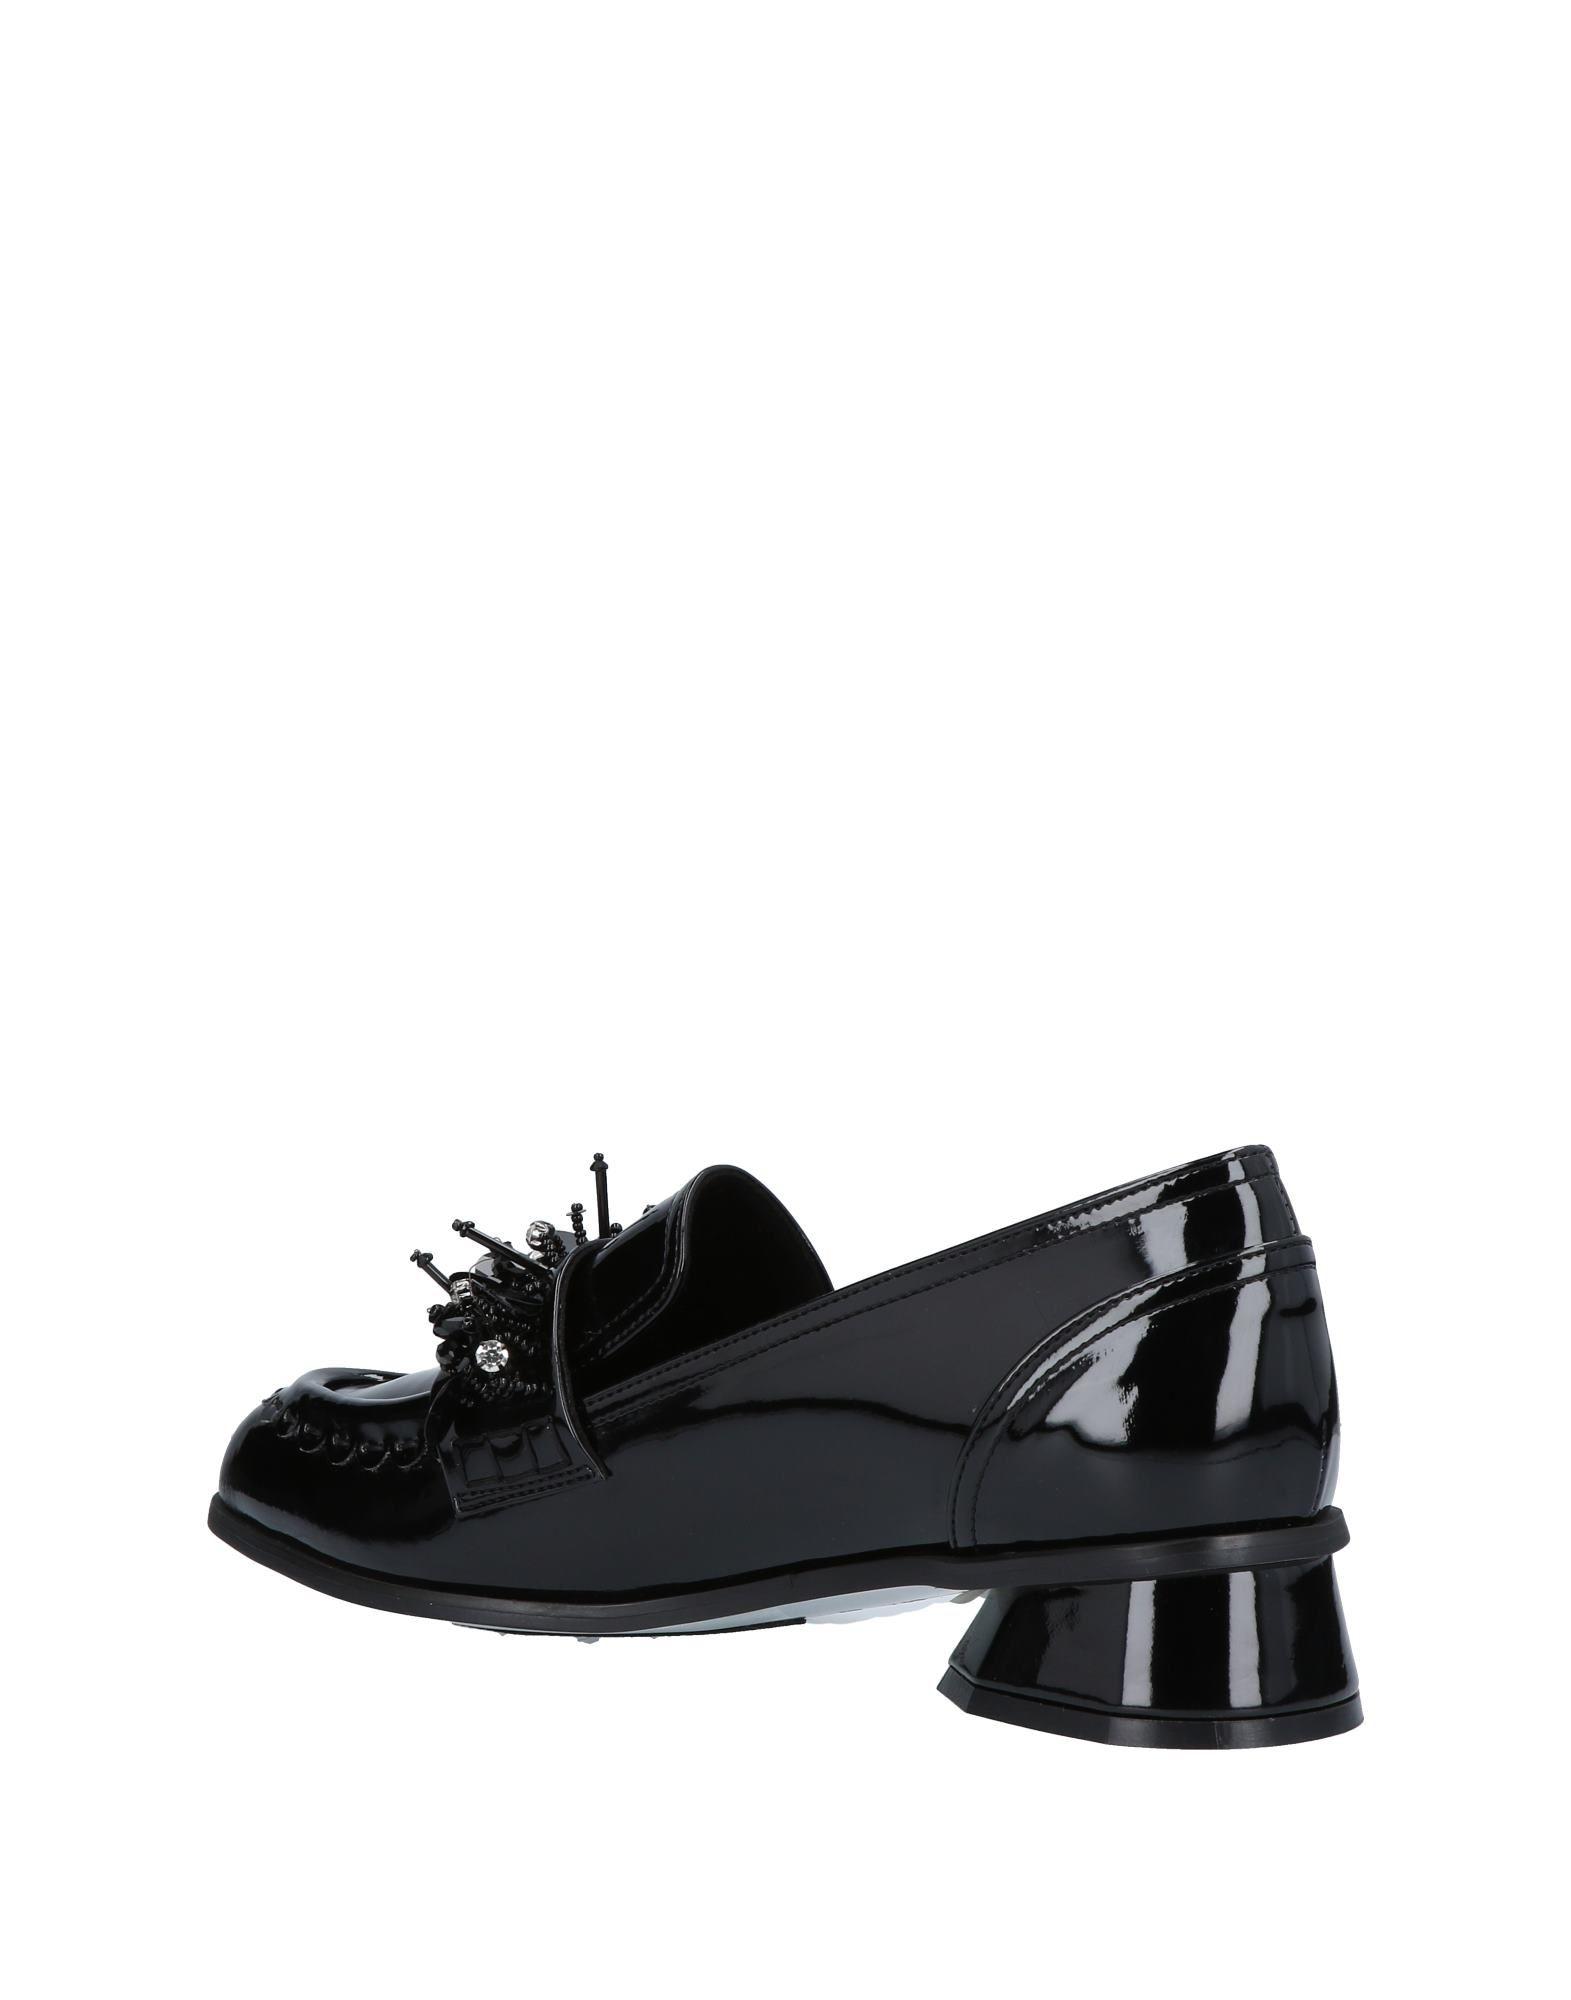 Stilvolle billige Schuhe Suecomma Bonnie 11453175NX Mokassins Damen  11453175NX Bonnie 3d4871